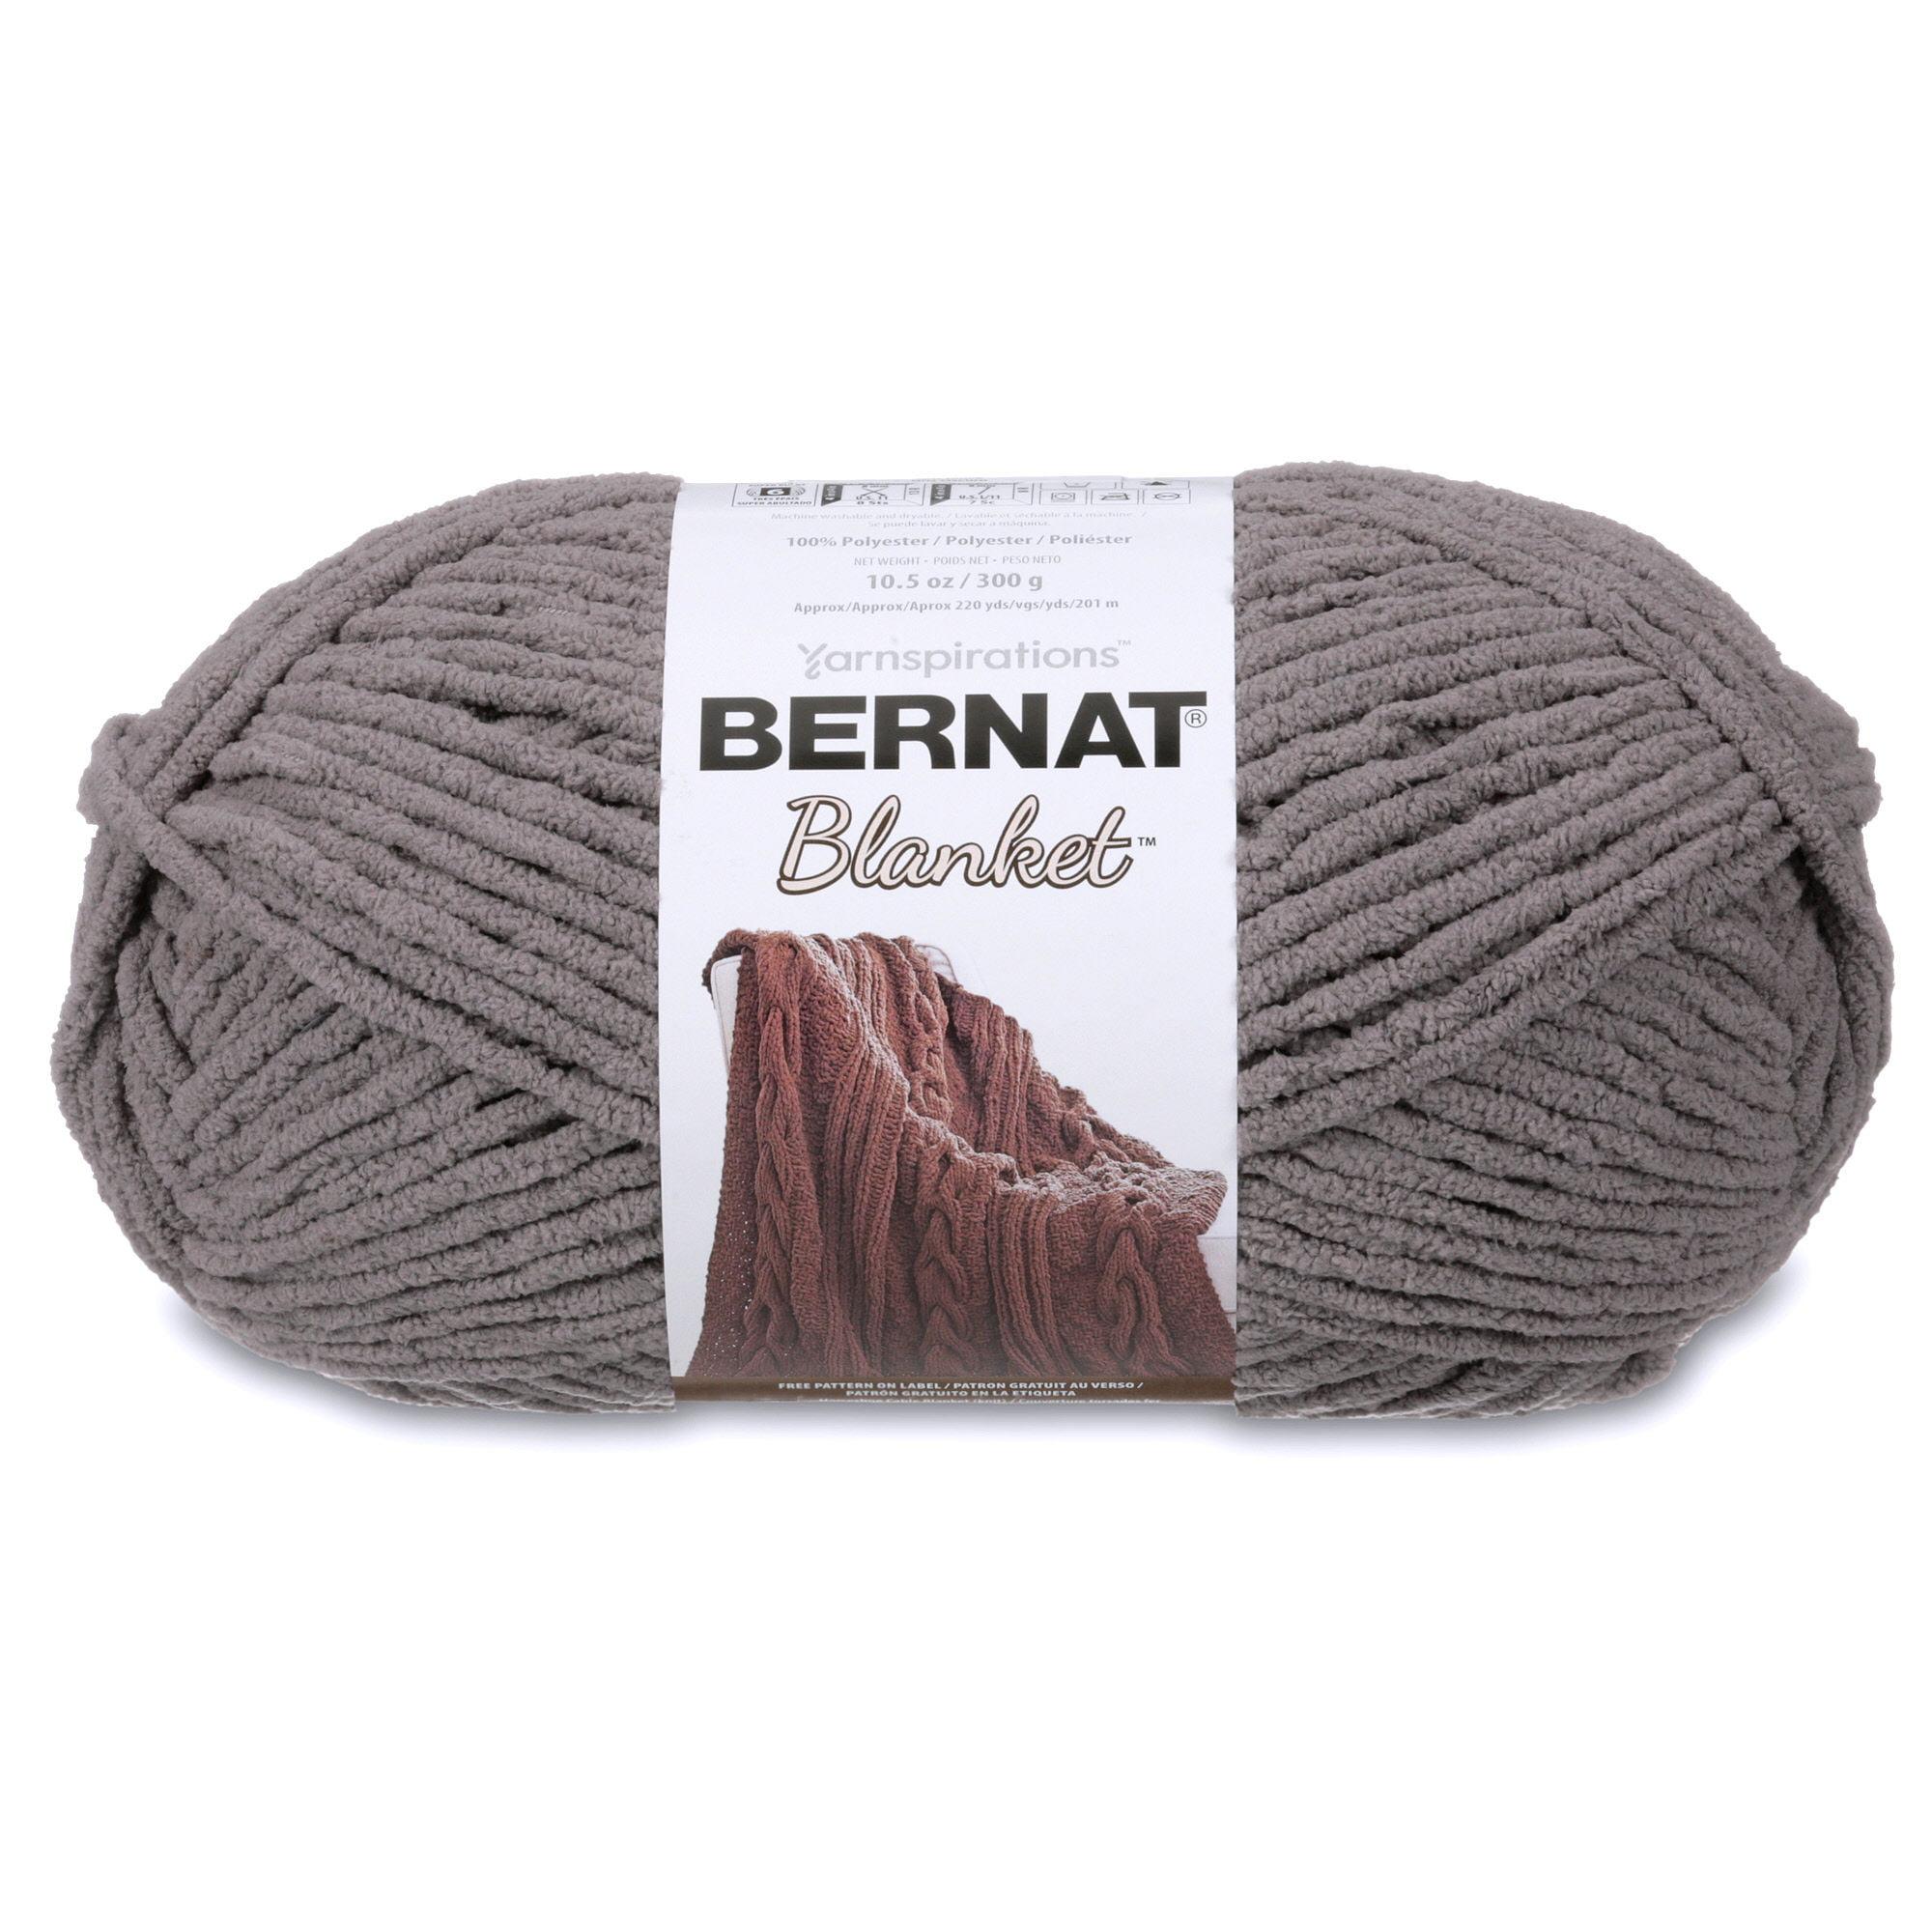 Bernat Blanket Big Ball Yarn - Walmart.com